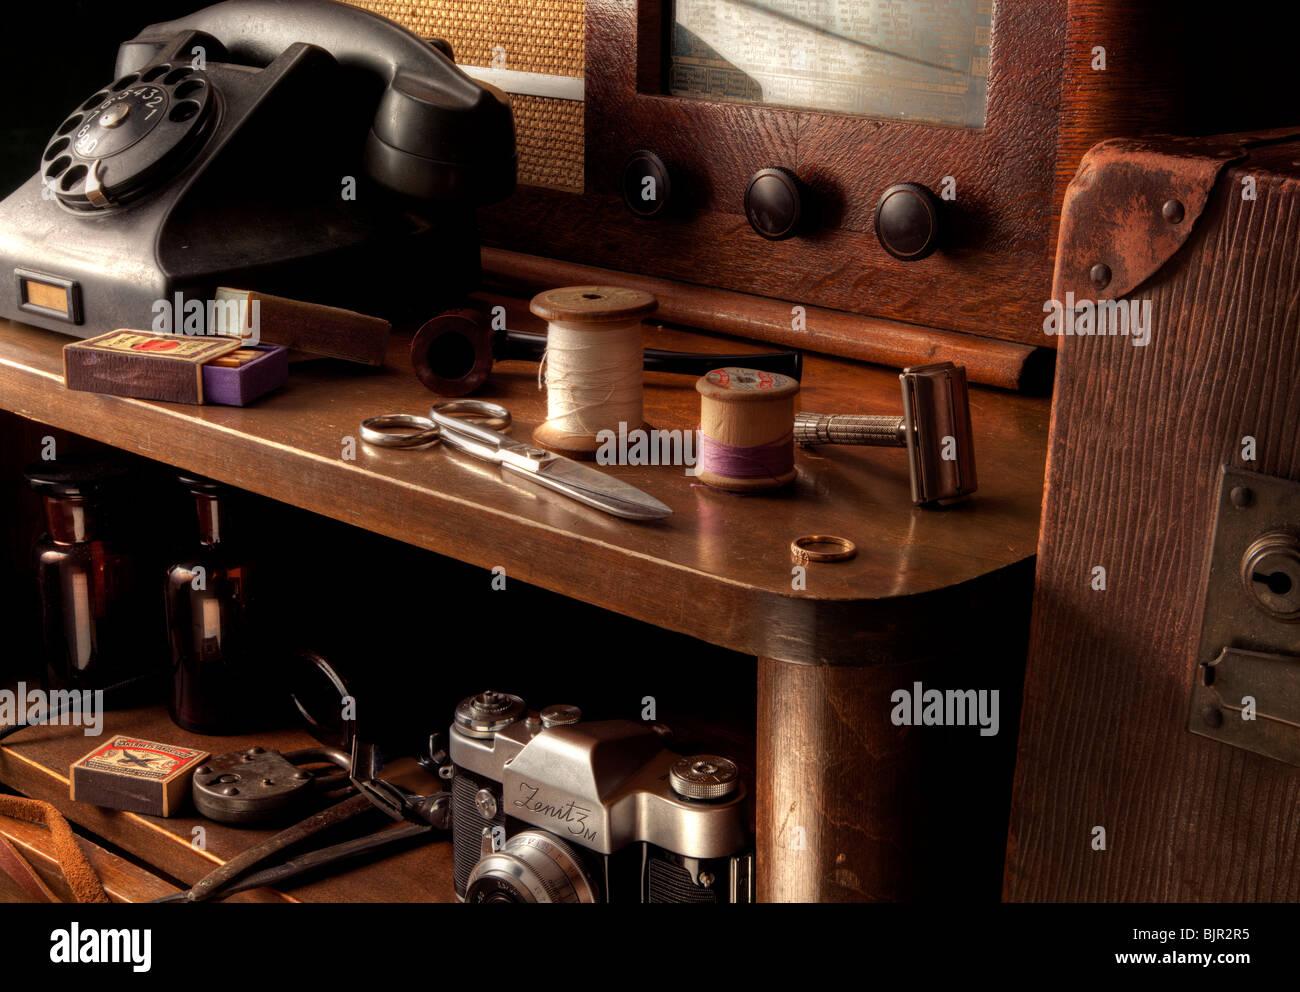 Vintage table scene still life - Stock Image